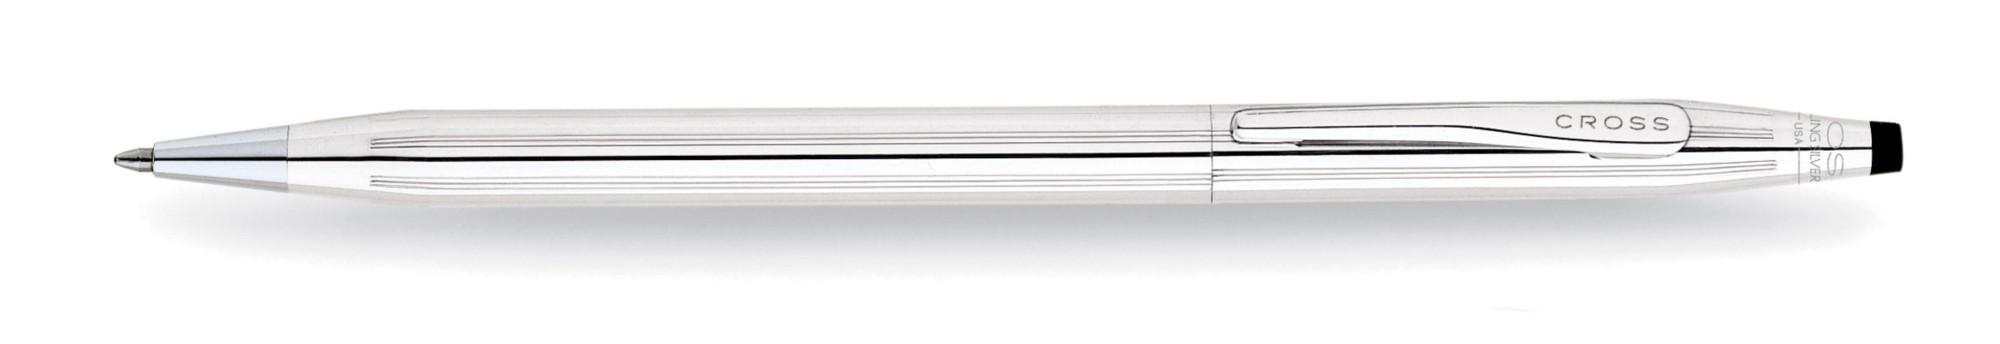 Шариковая ручка Cross Century Classic Sterling Silver